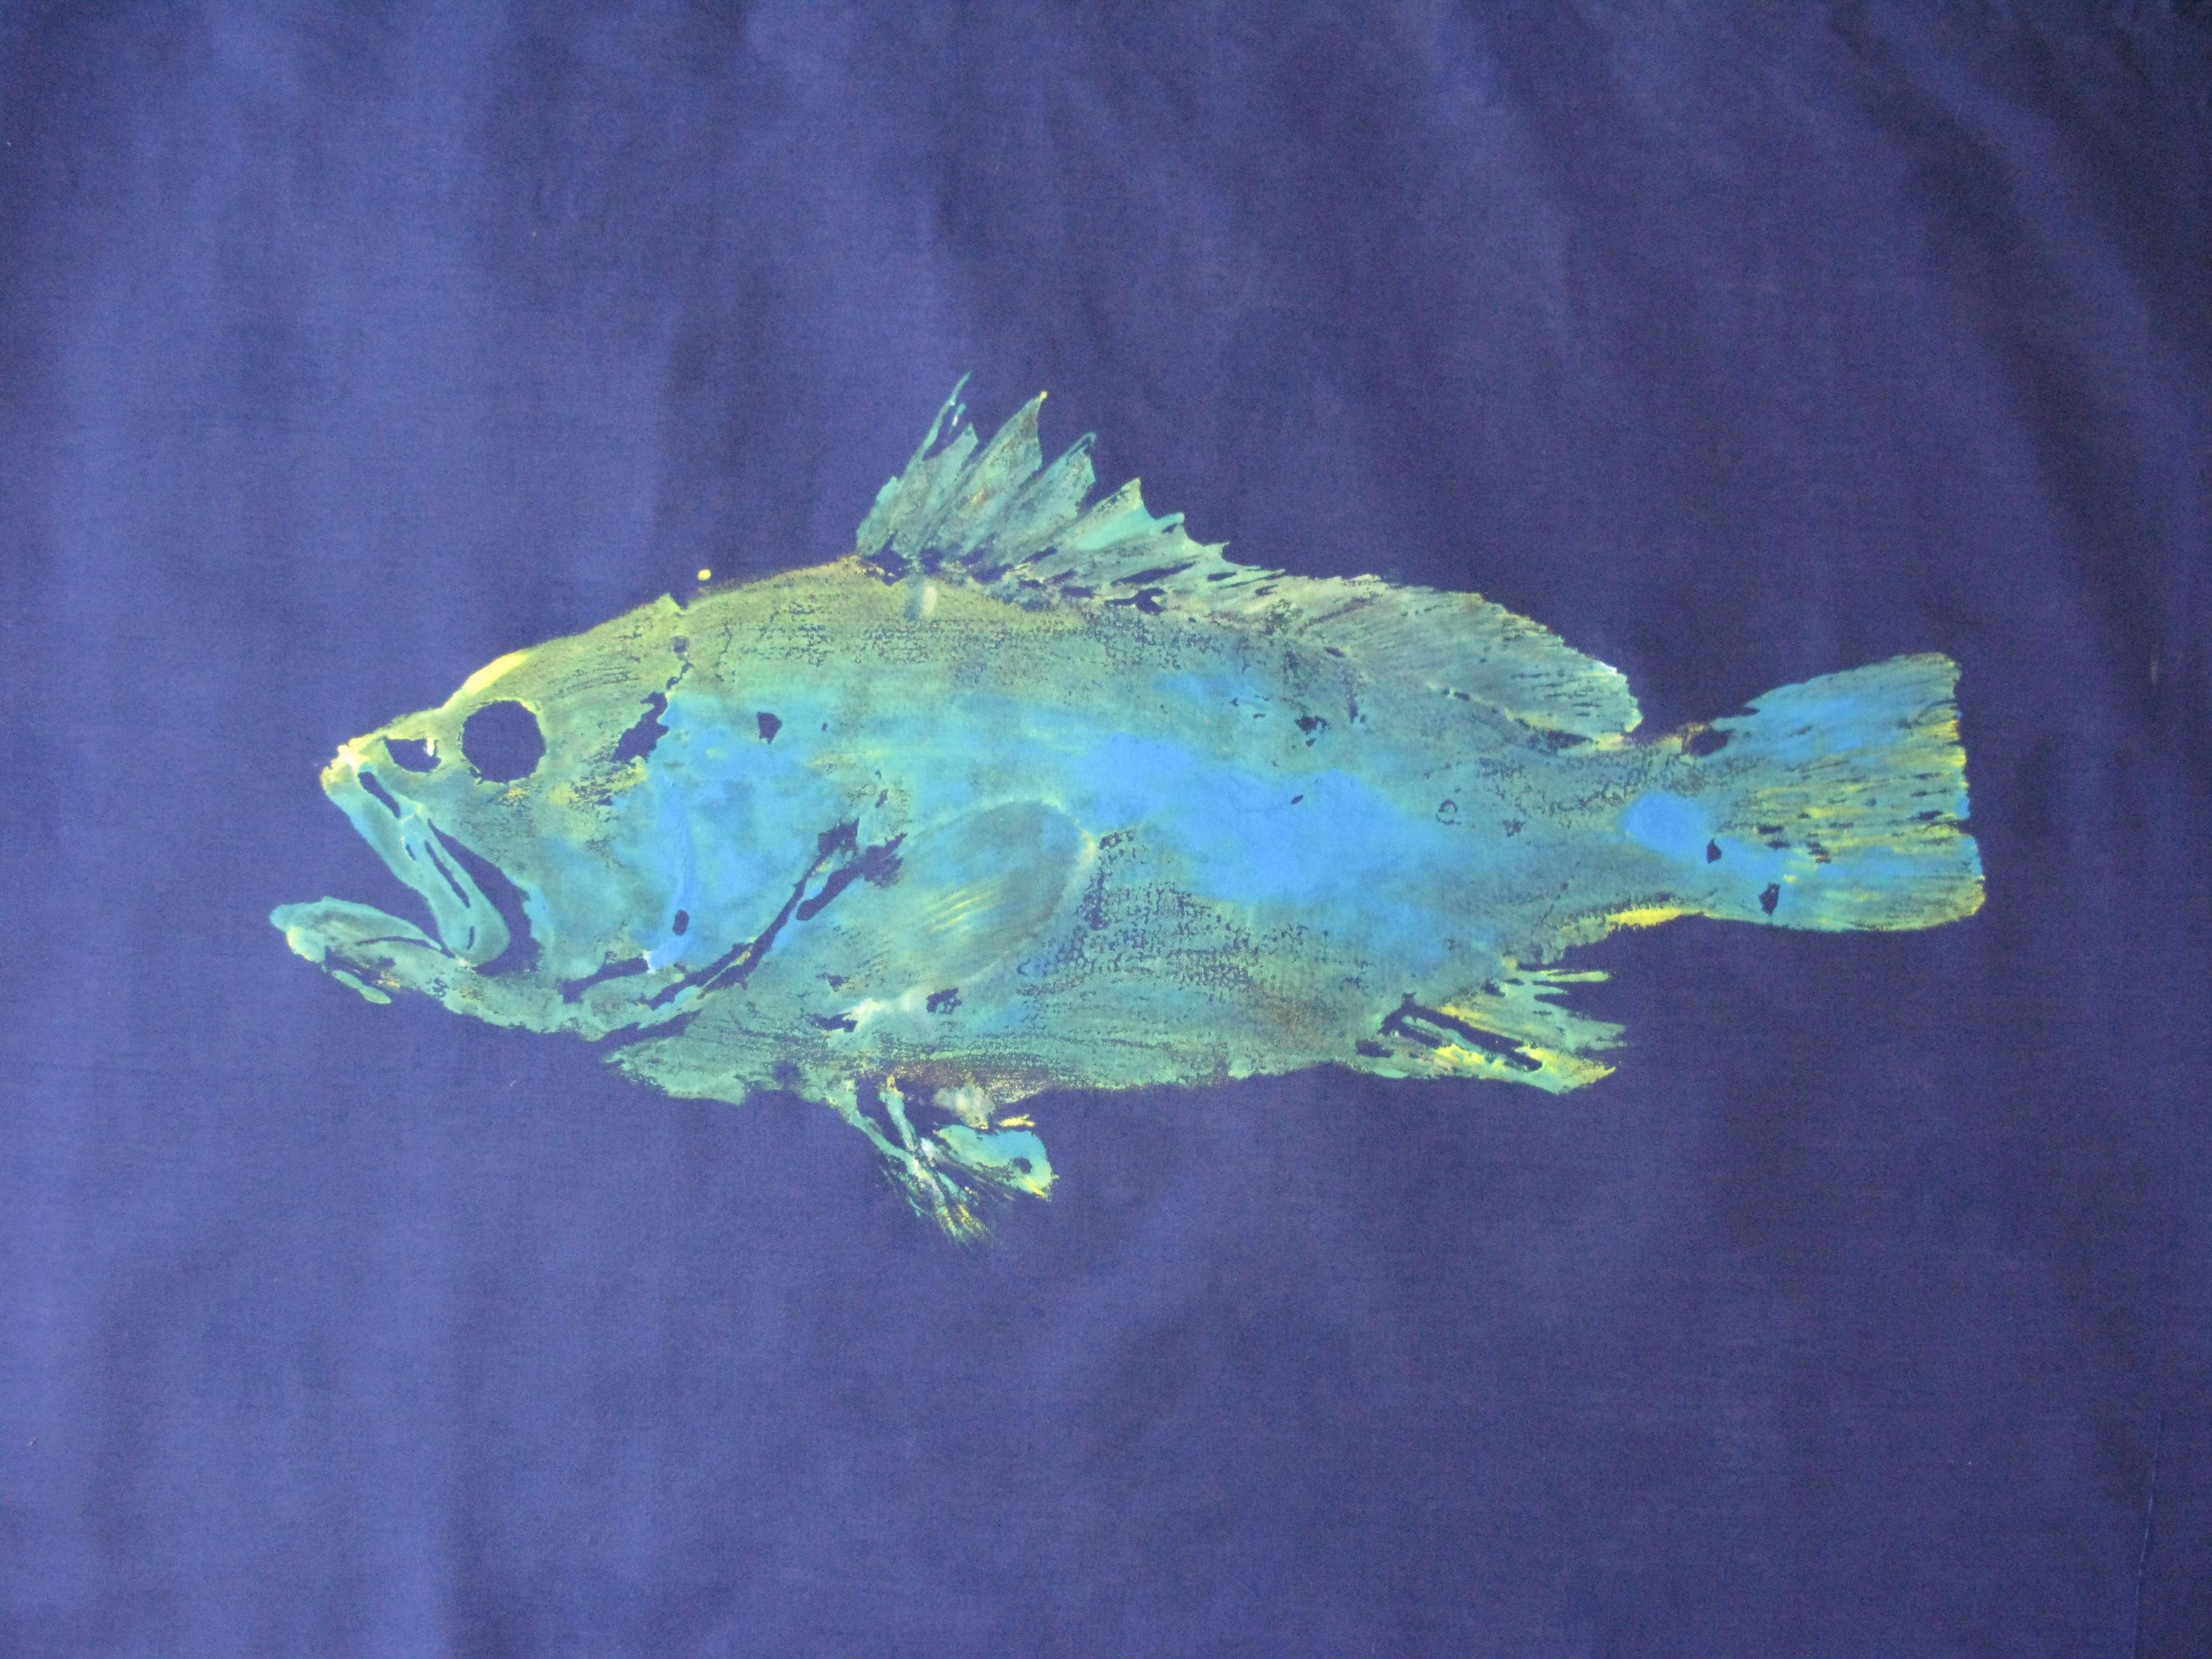 KOA Fish Prints 001.JPG